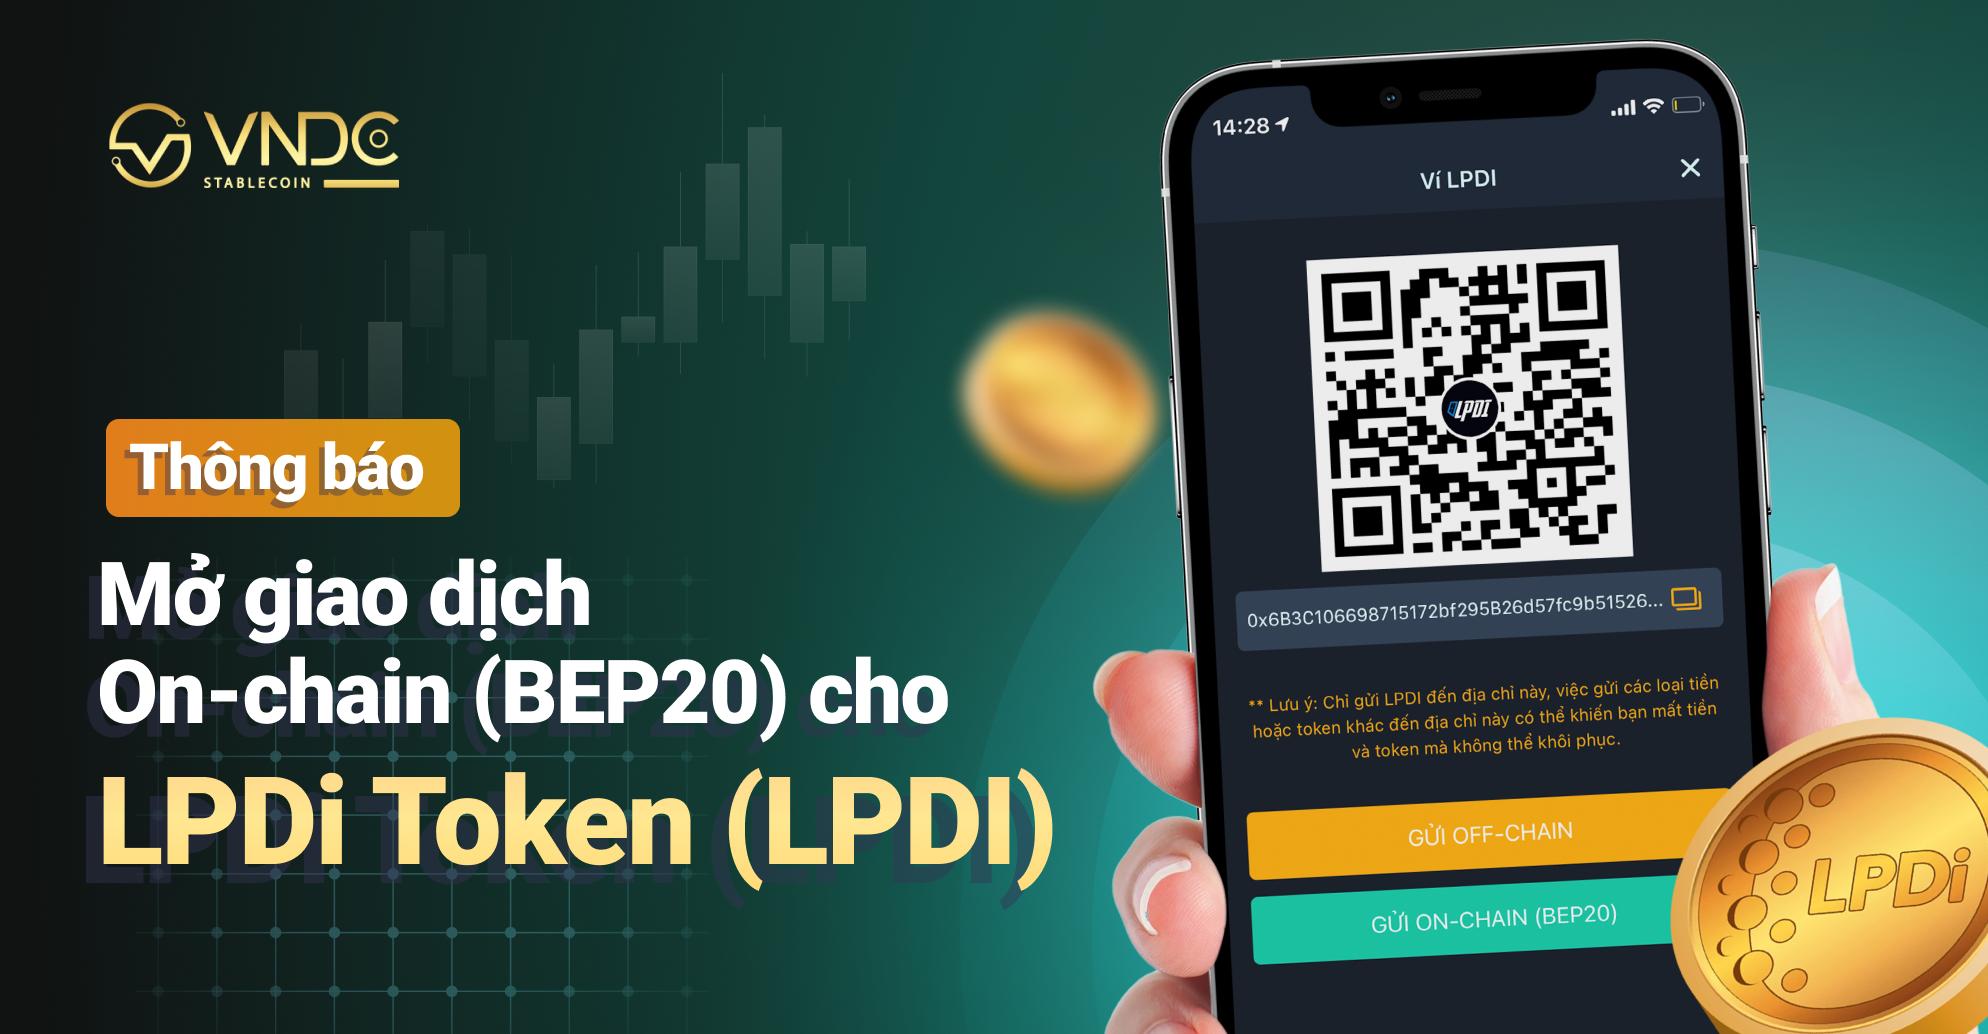 Mở giao dịch On-chain (BEP20) cho LPDi Token (LPDI)